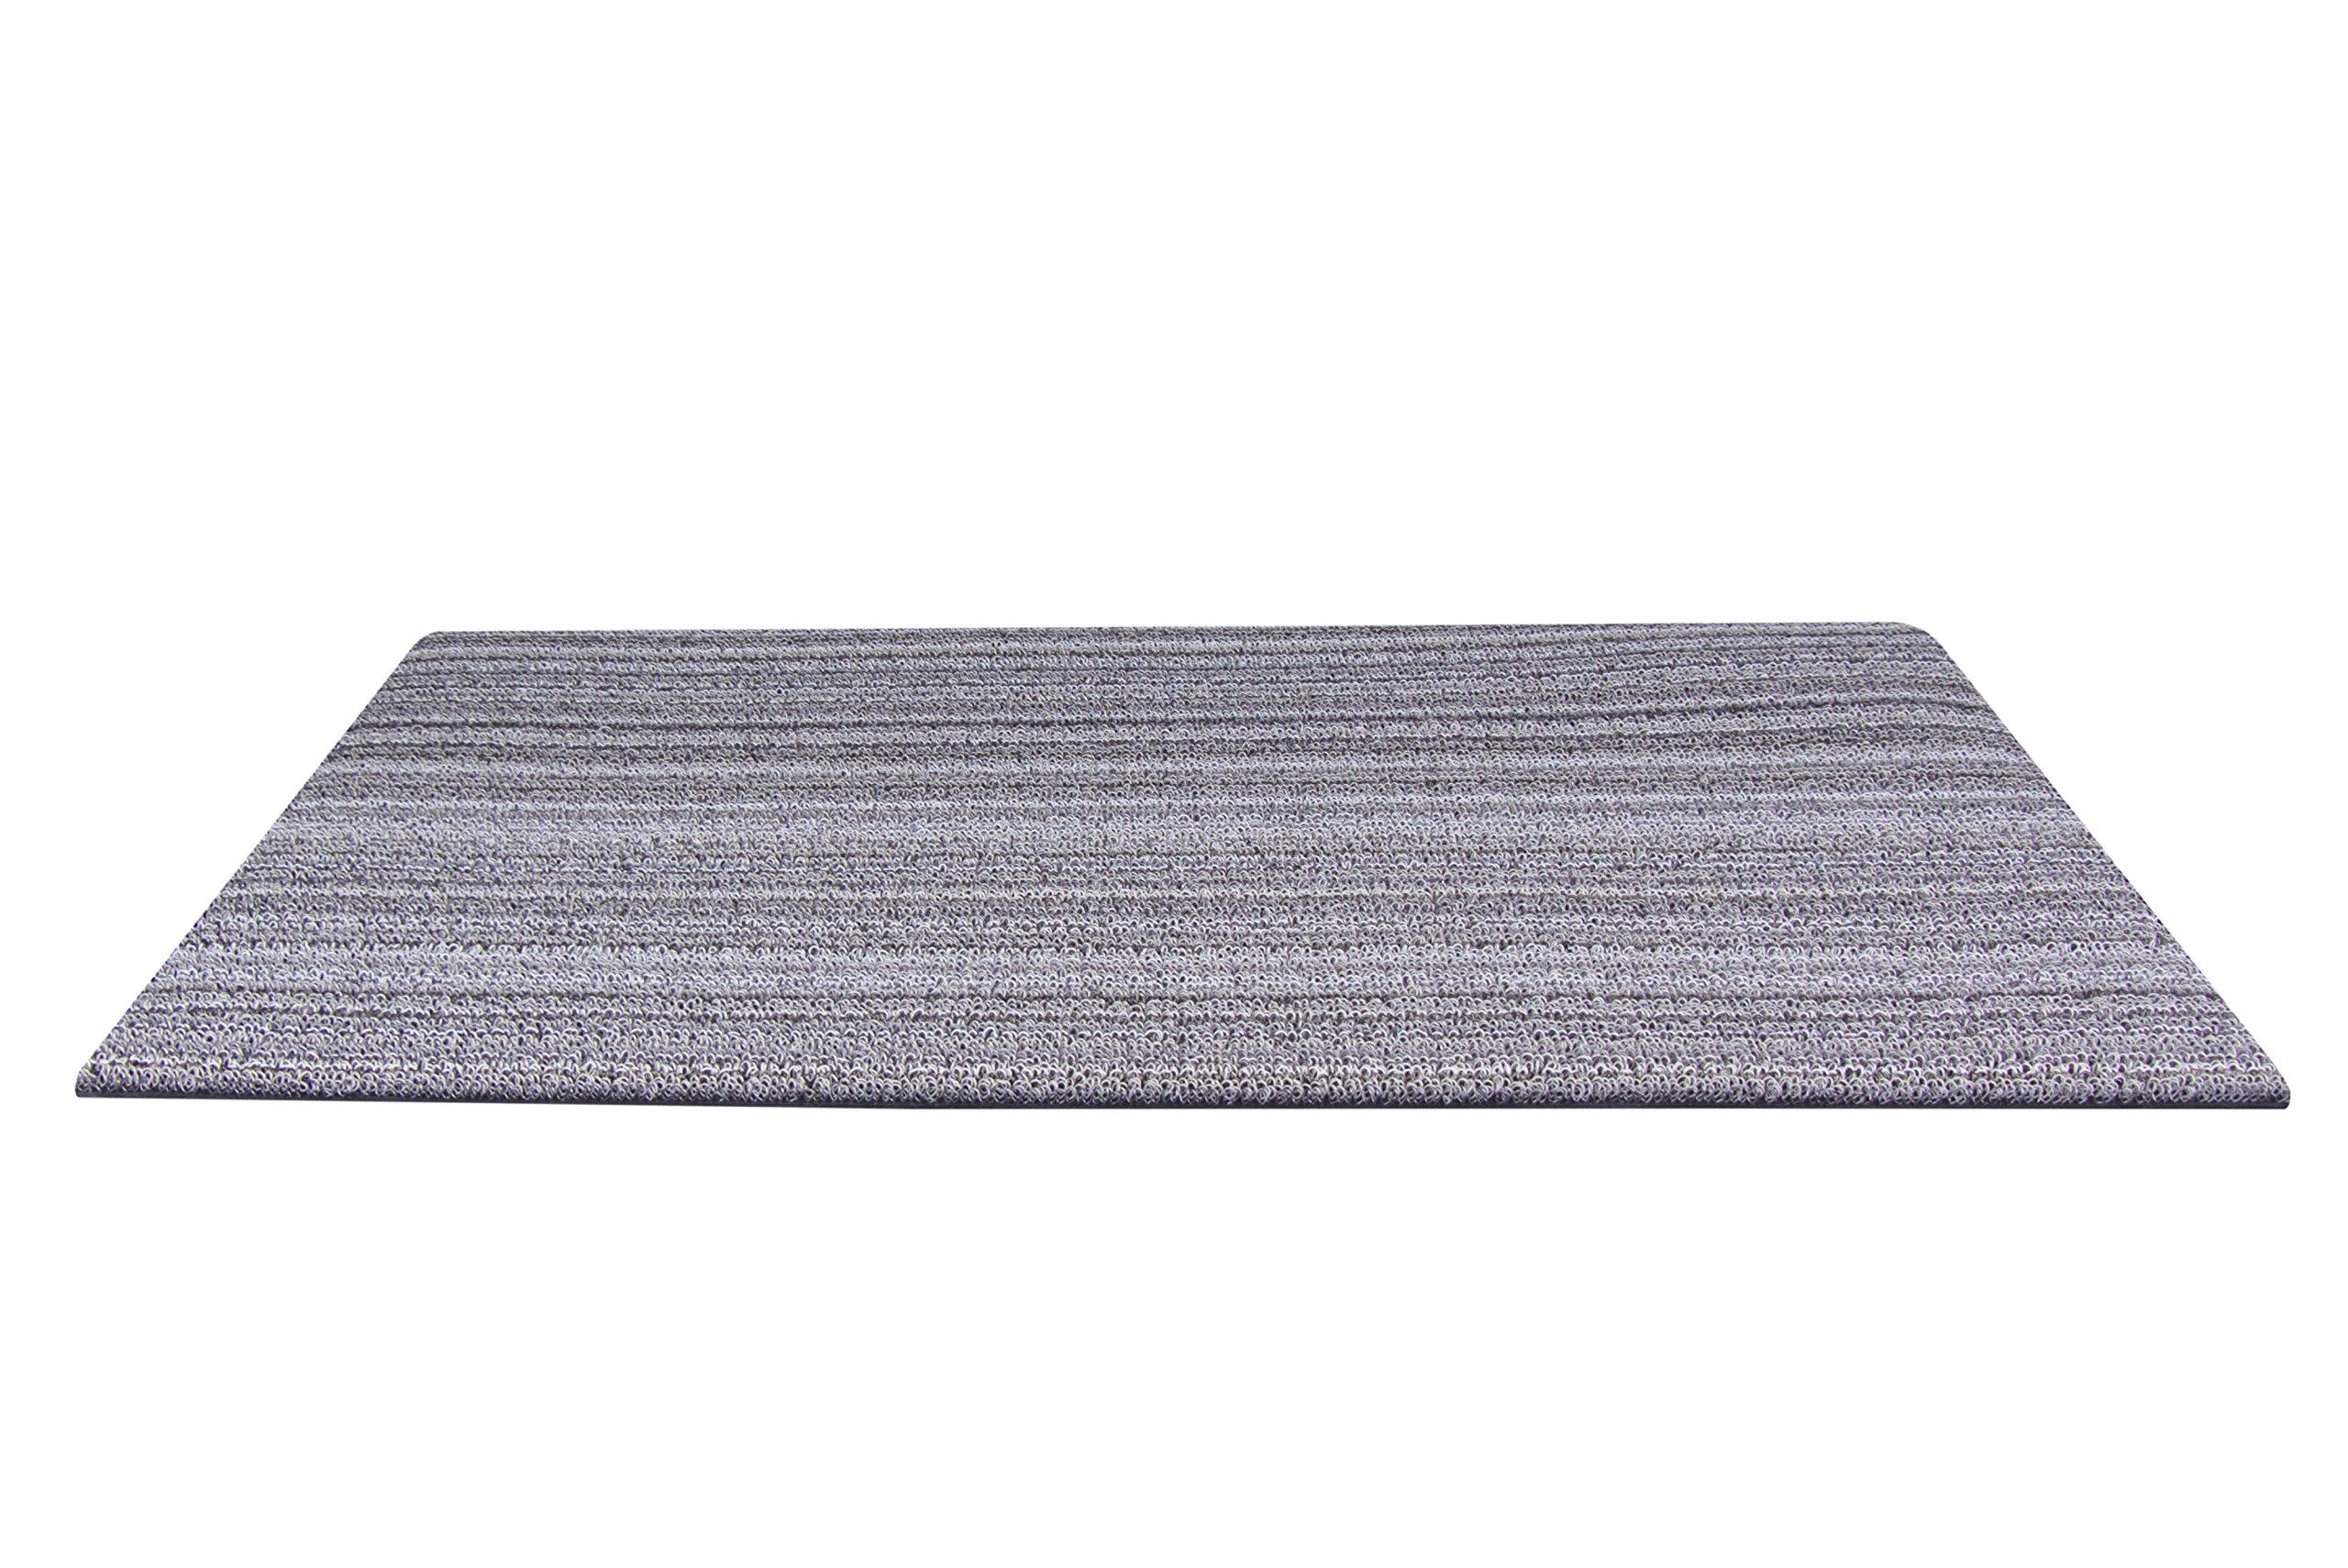 Chilewich Skinny Stripe Doormat, 18 by 28-Inch, Birch by Chilewich (Image #1)